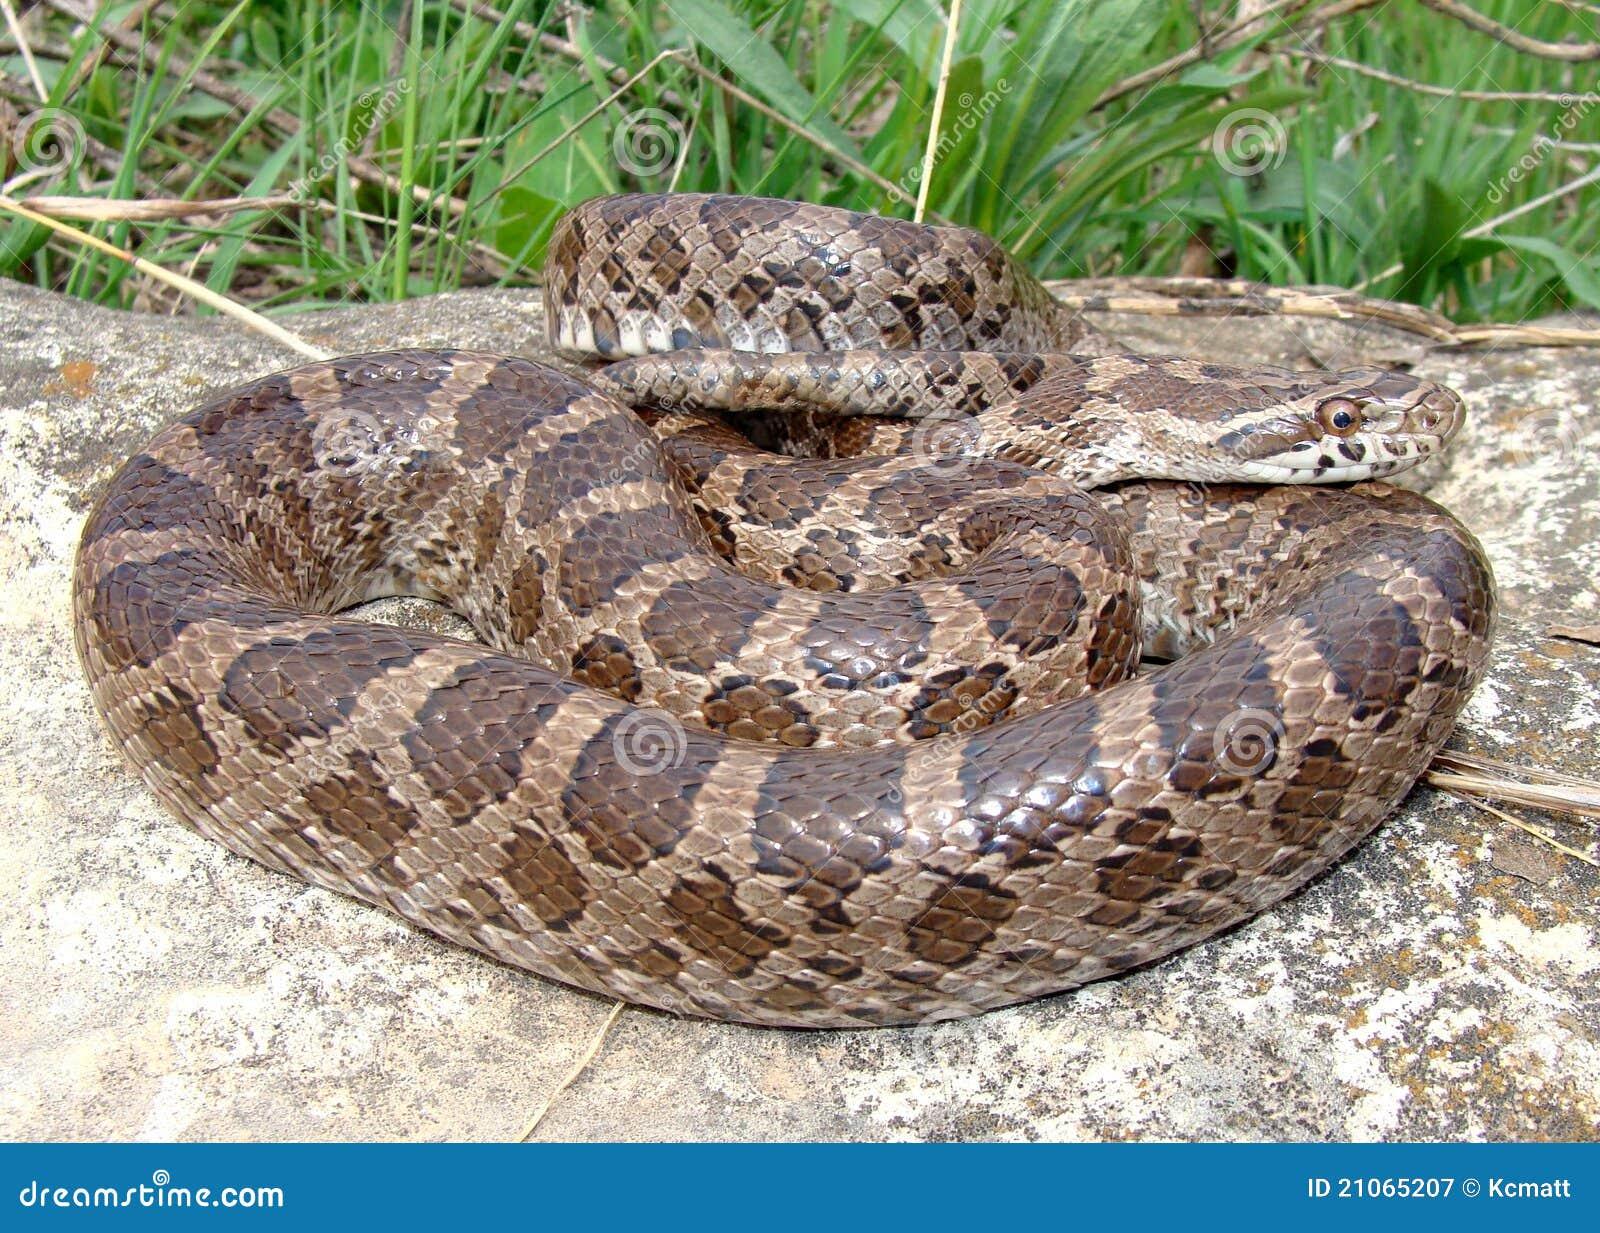 King Rat Snake Royalty Free Stock Photography - Image: 35135537